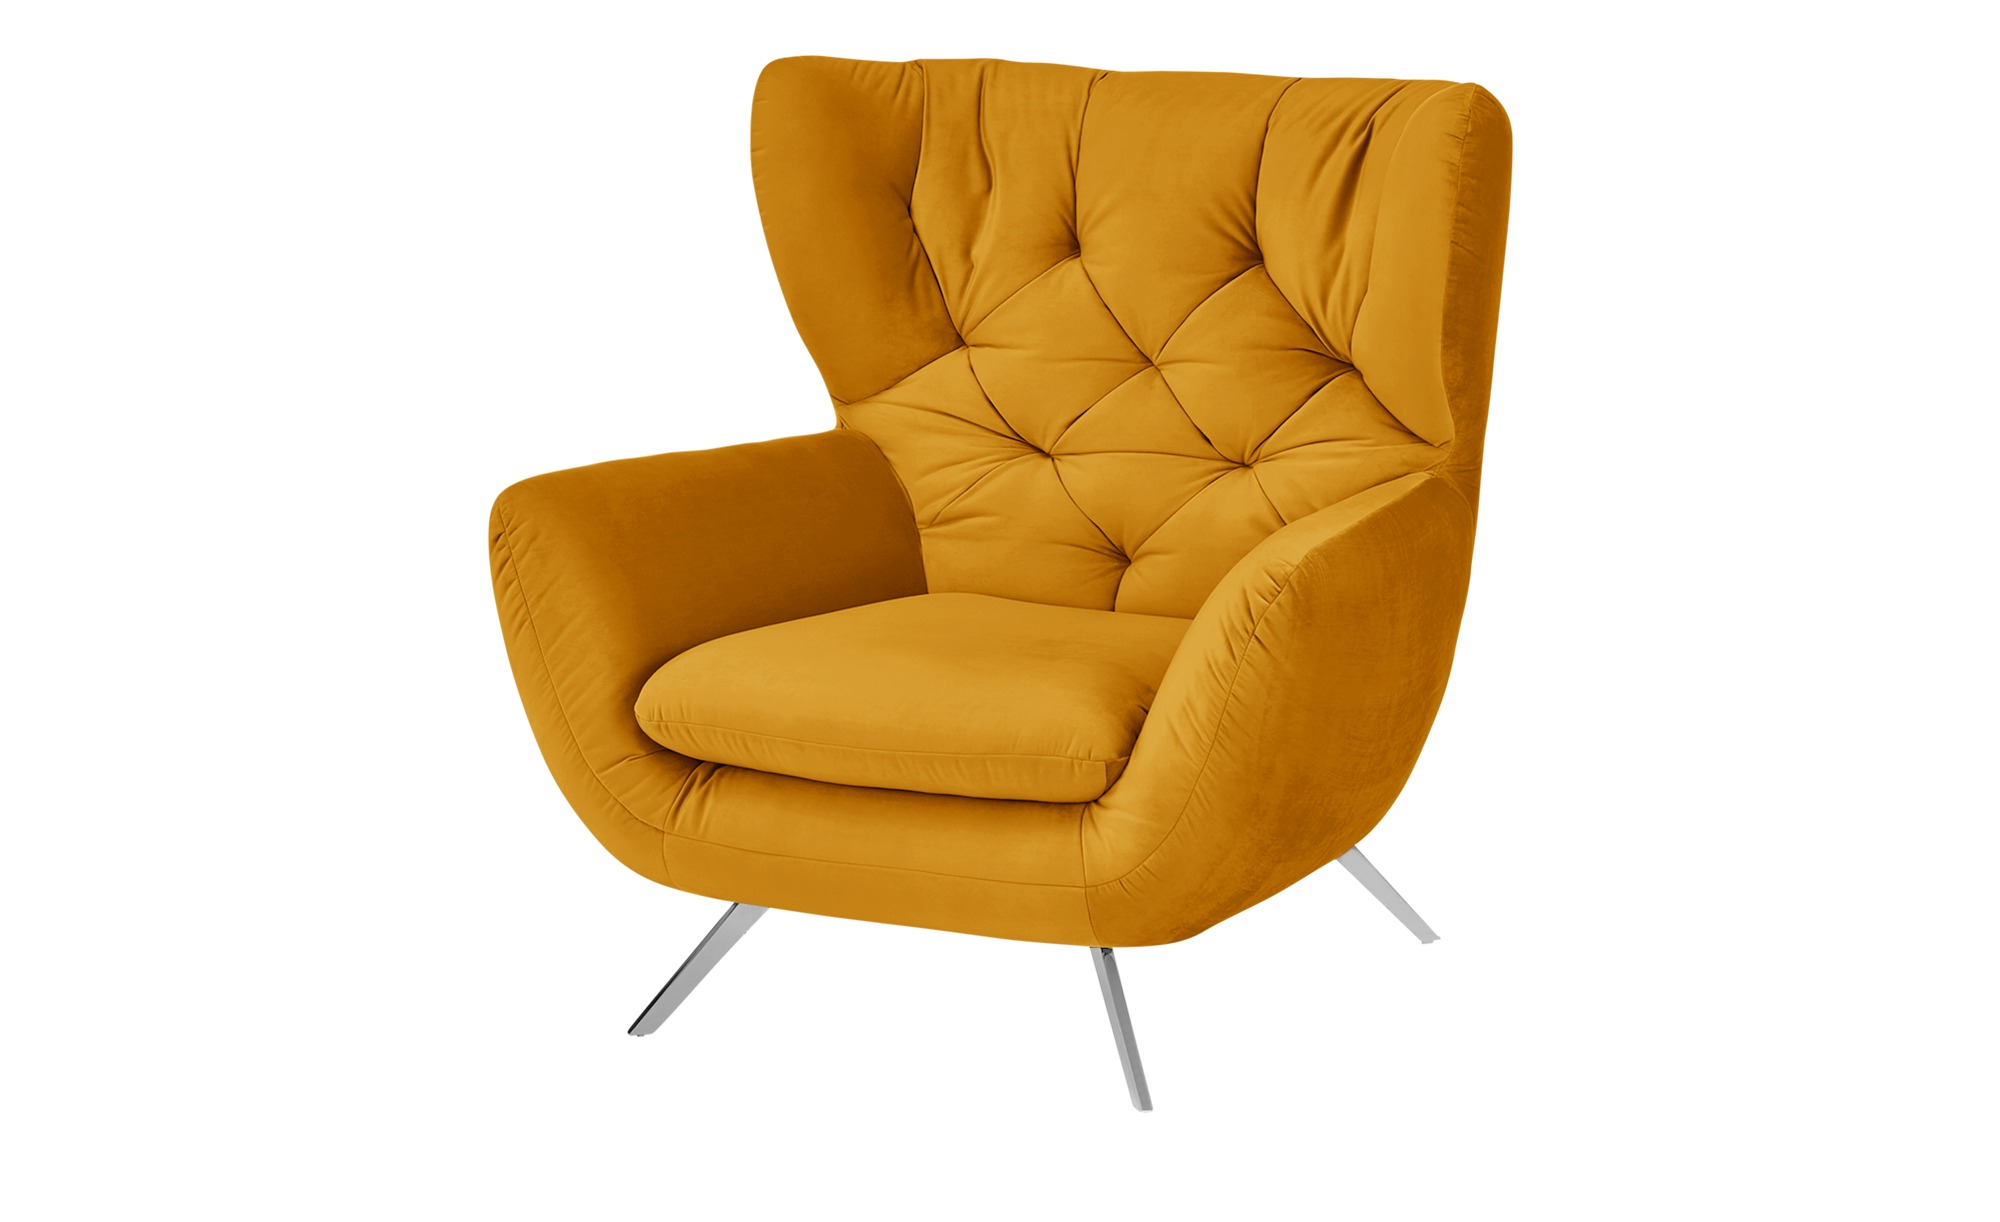 pop Hochlehnsessel  Caldara ¦ gelb ¦ Maße (cm): B: 100 H: 106 T: 95 Polstermöbel > Sessel > Ohrensessel - Höffner